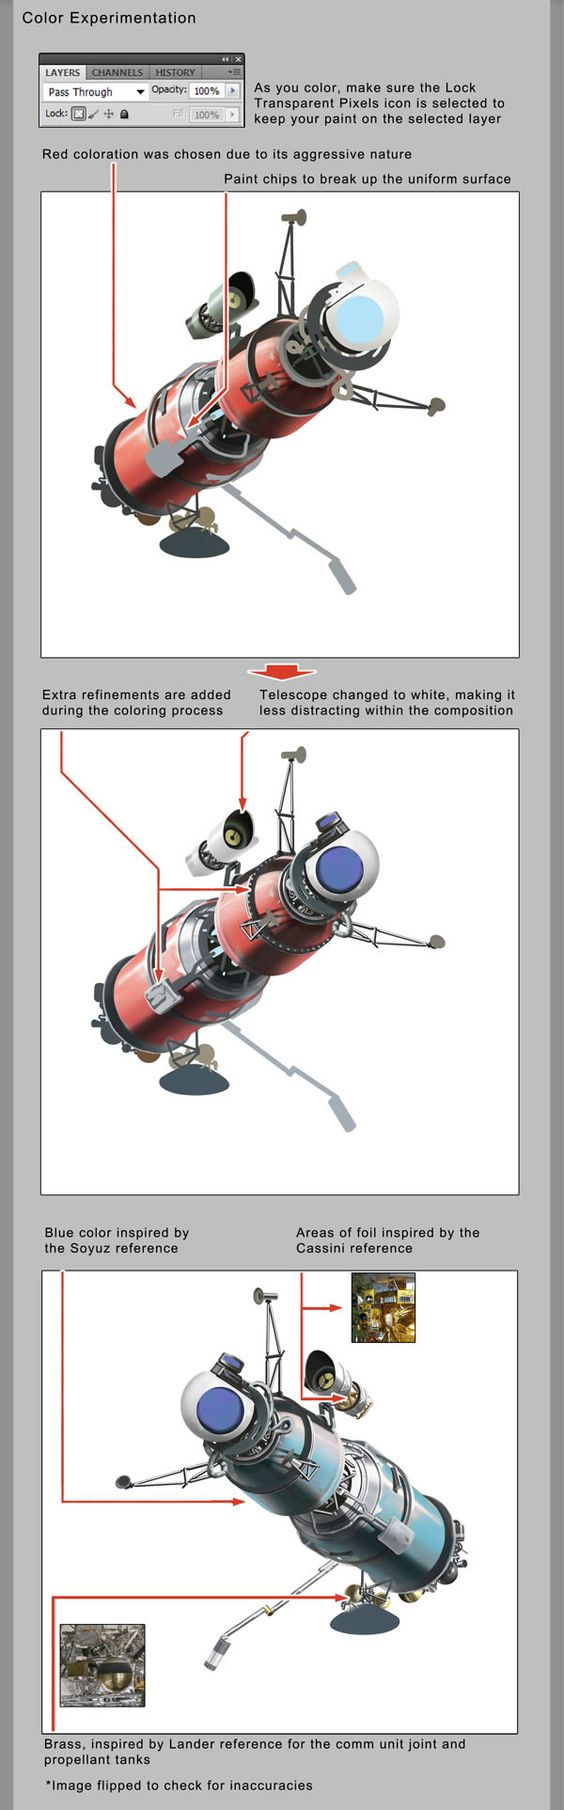 Planebucket shipbucket archive forum military pinterest technical illustration